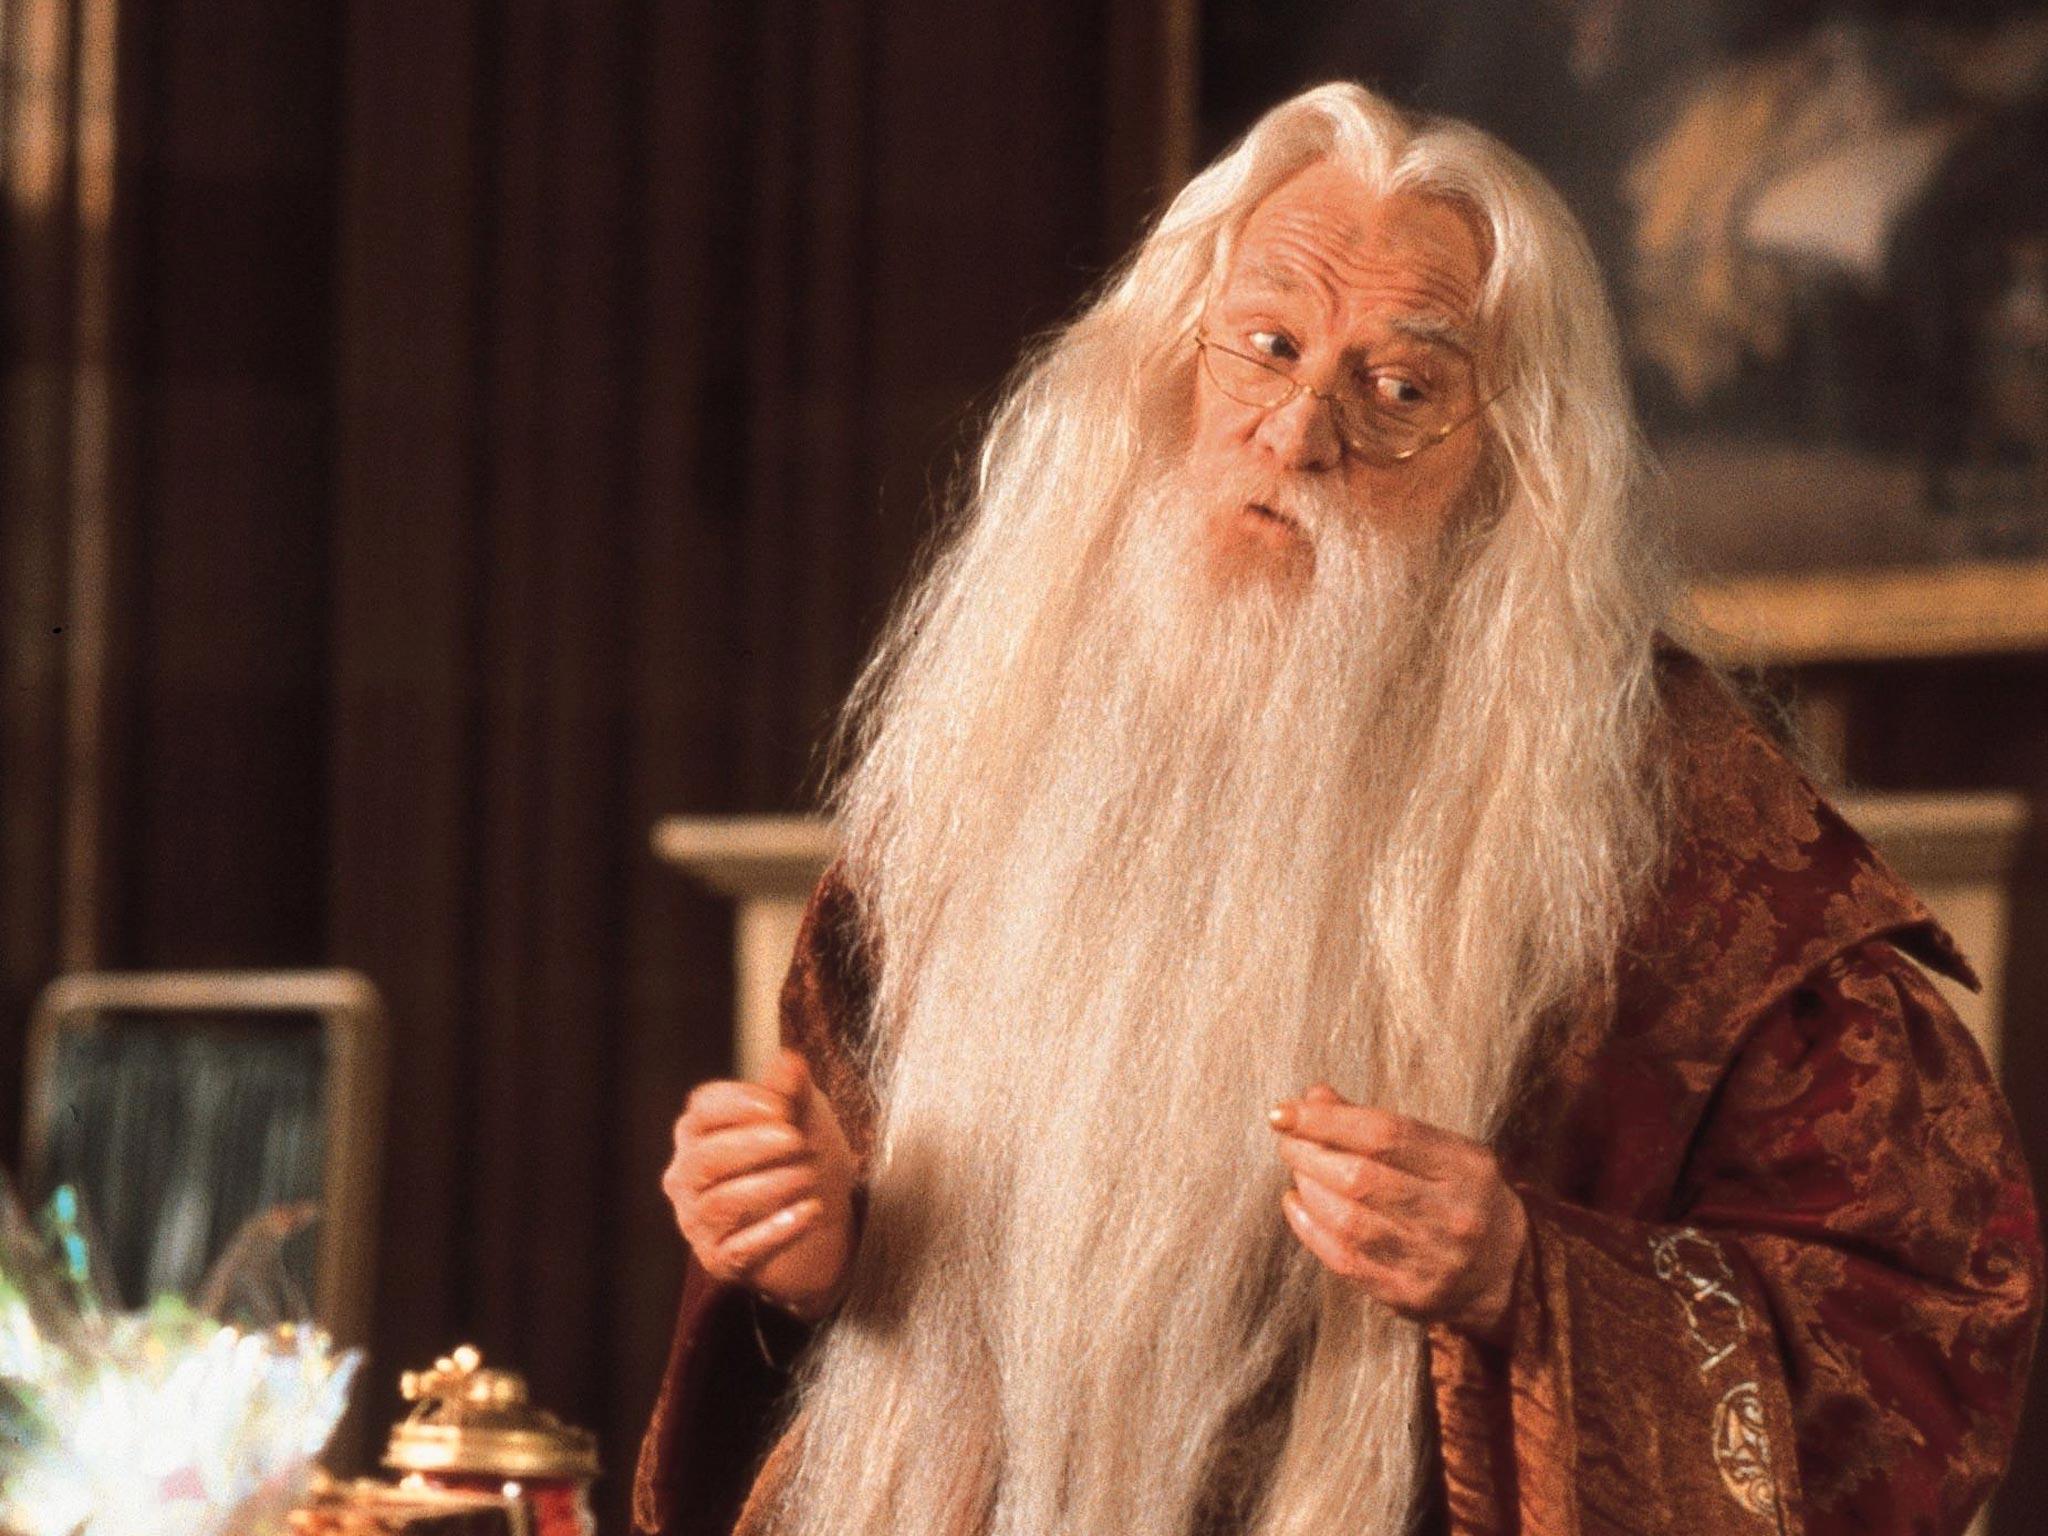 Санта-Клаус живёт в мире Гарри Поттера, решили фанаты на Reddit